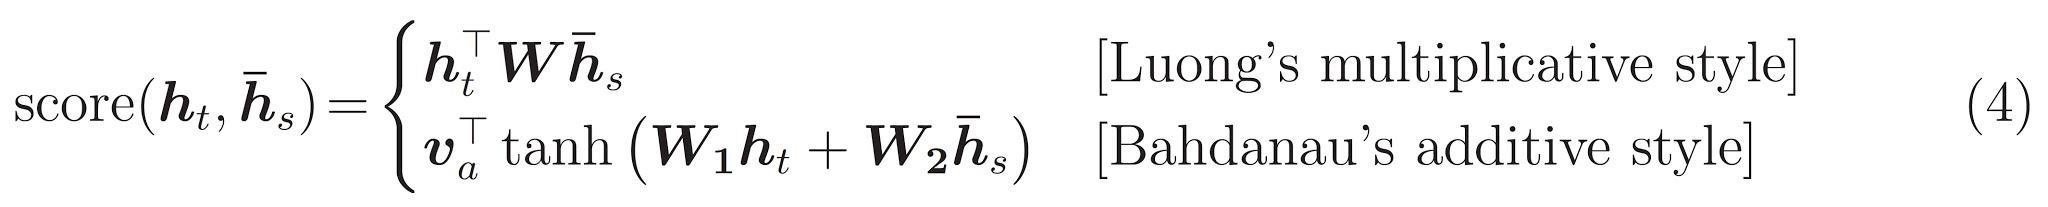 attention equation 4